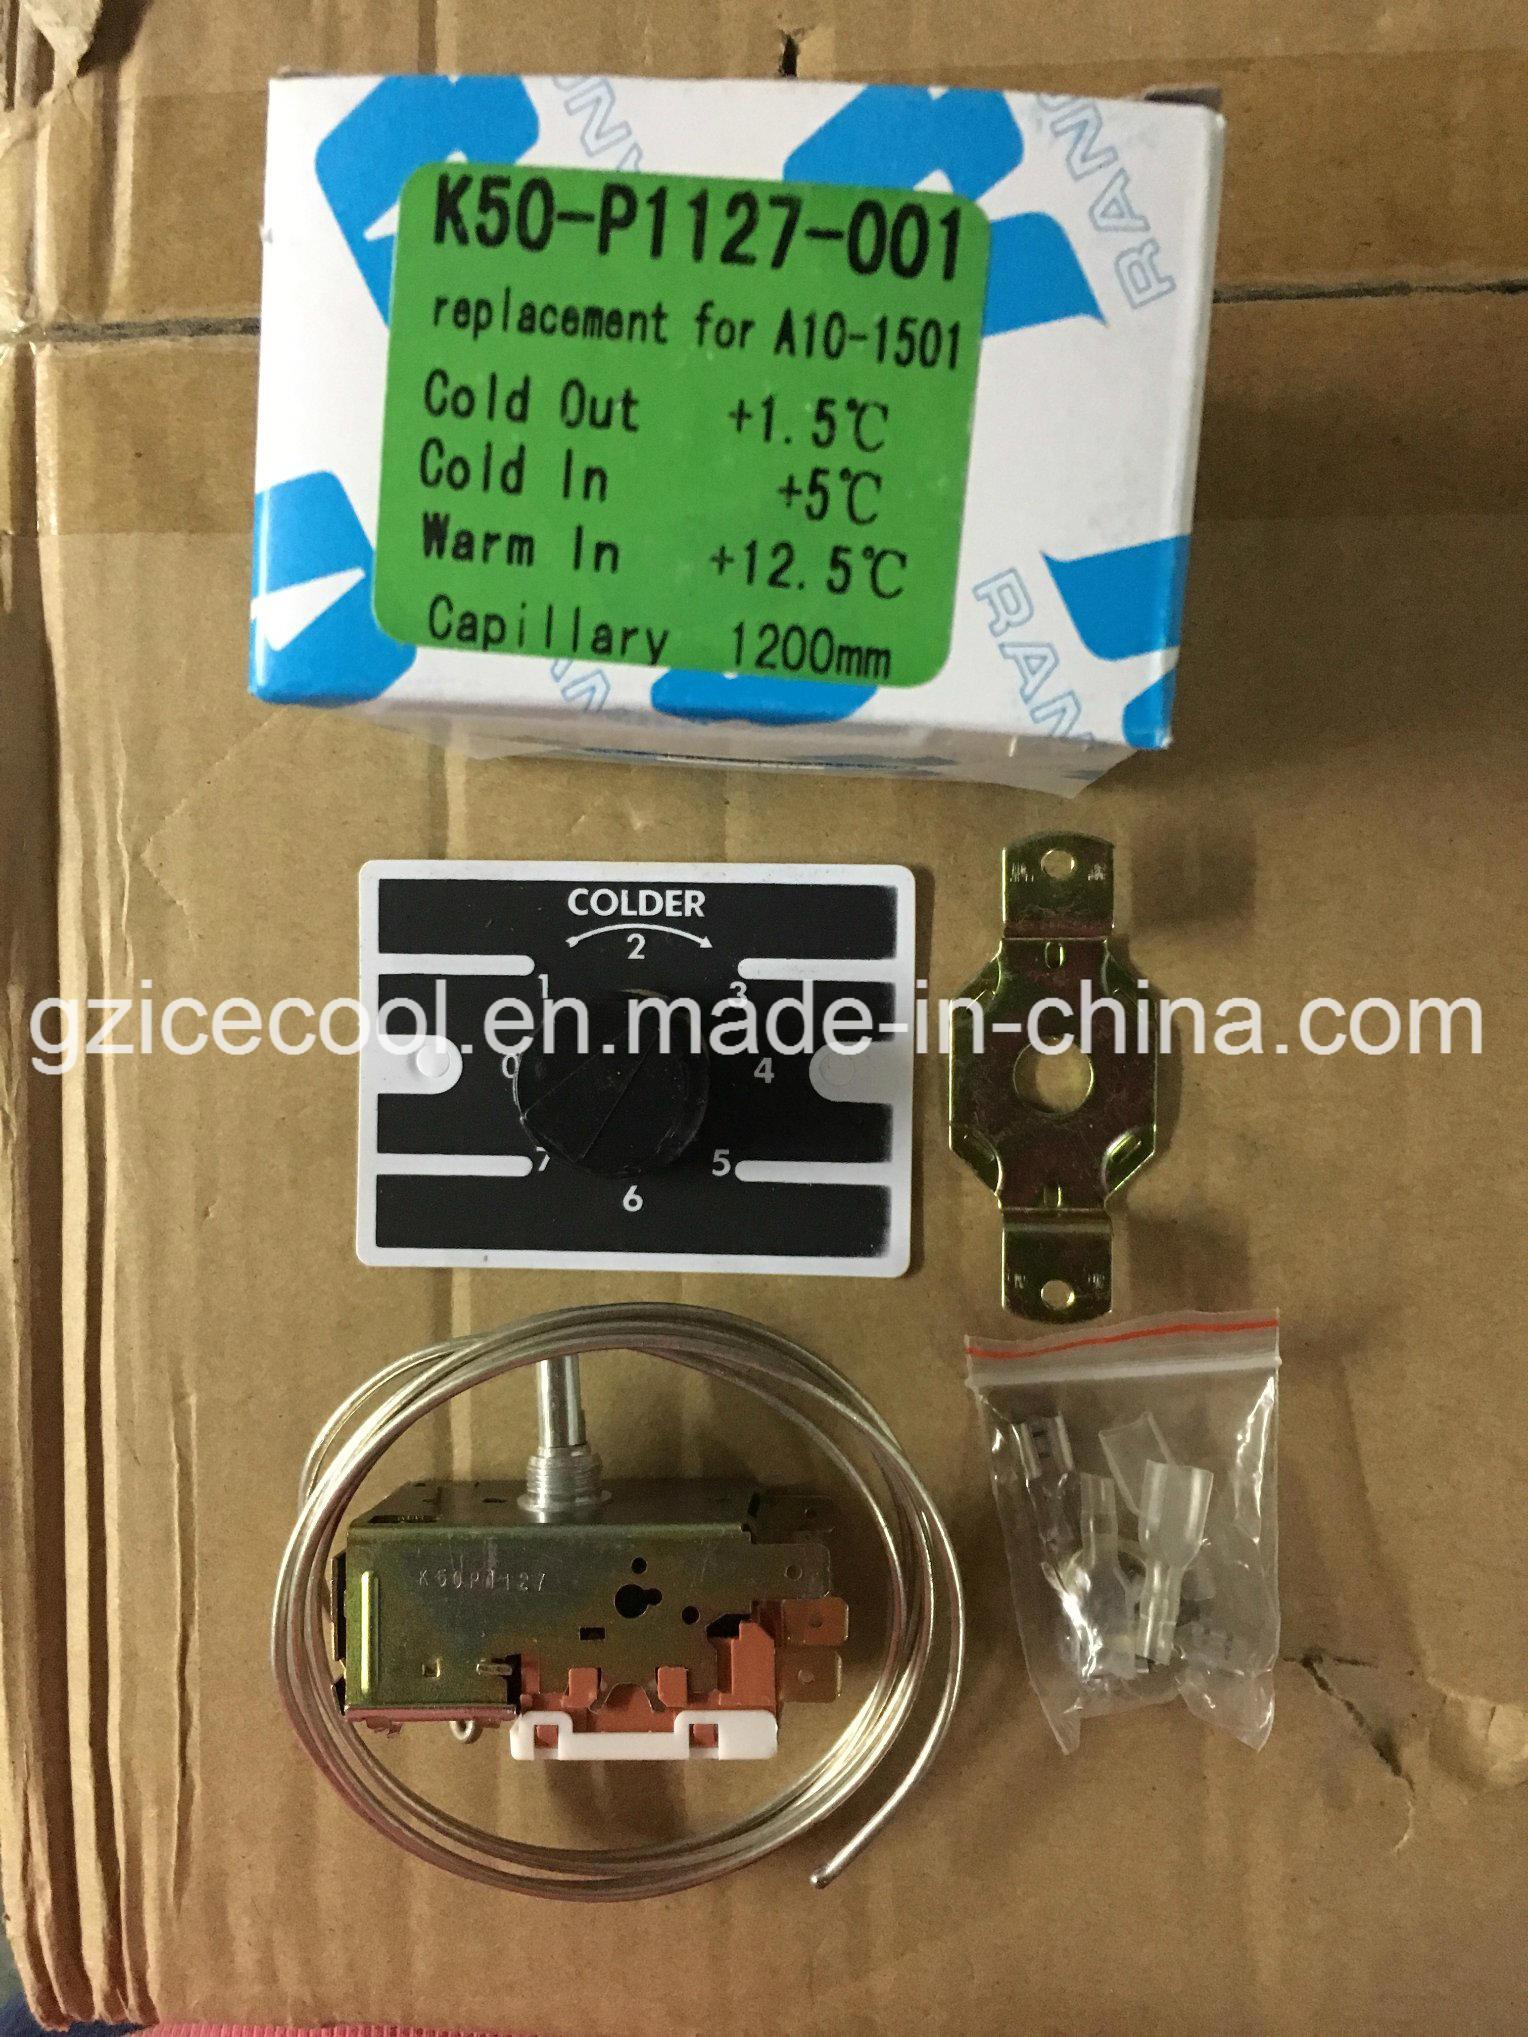 Ranco Manual Thermostat Wiring Diagram on